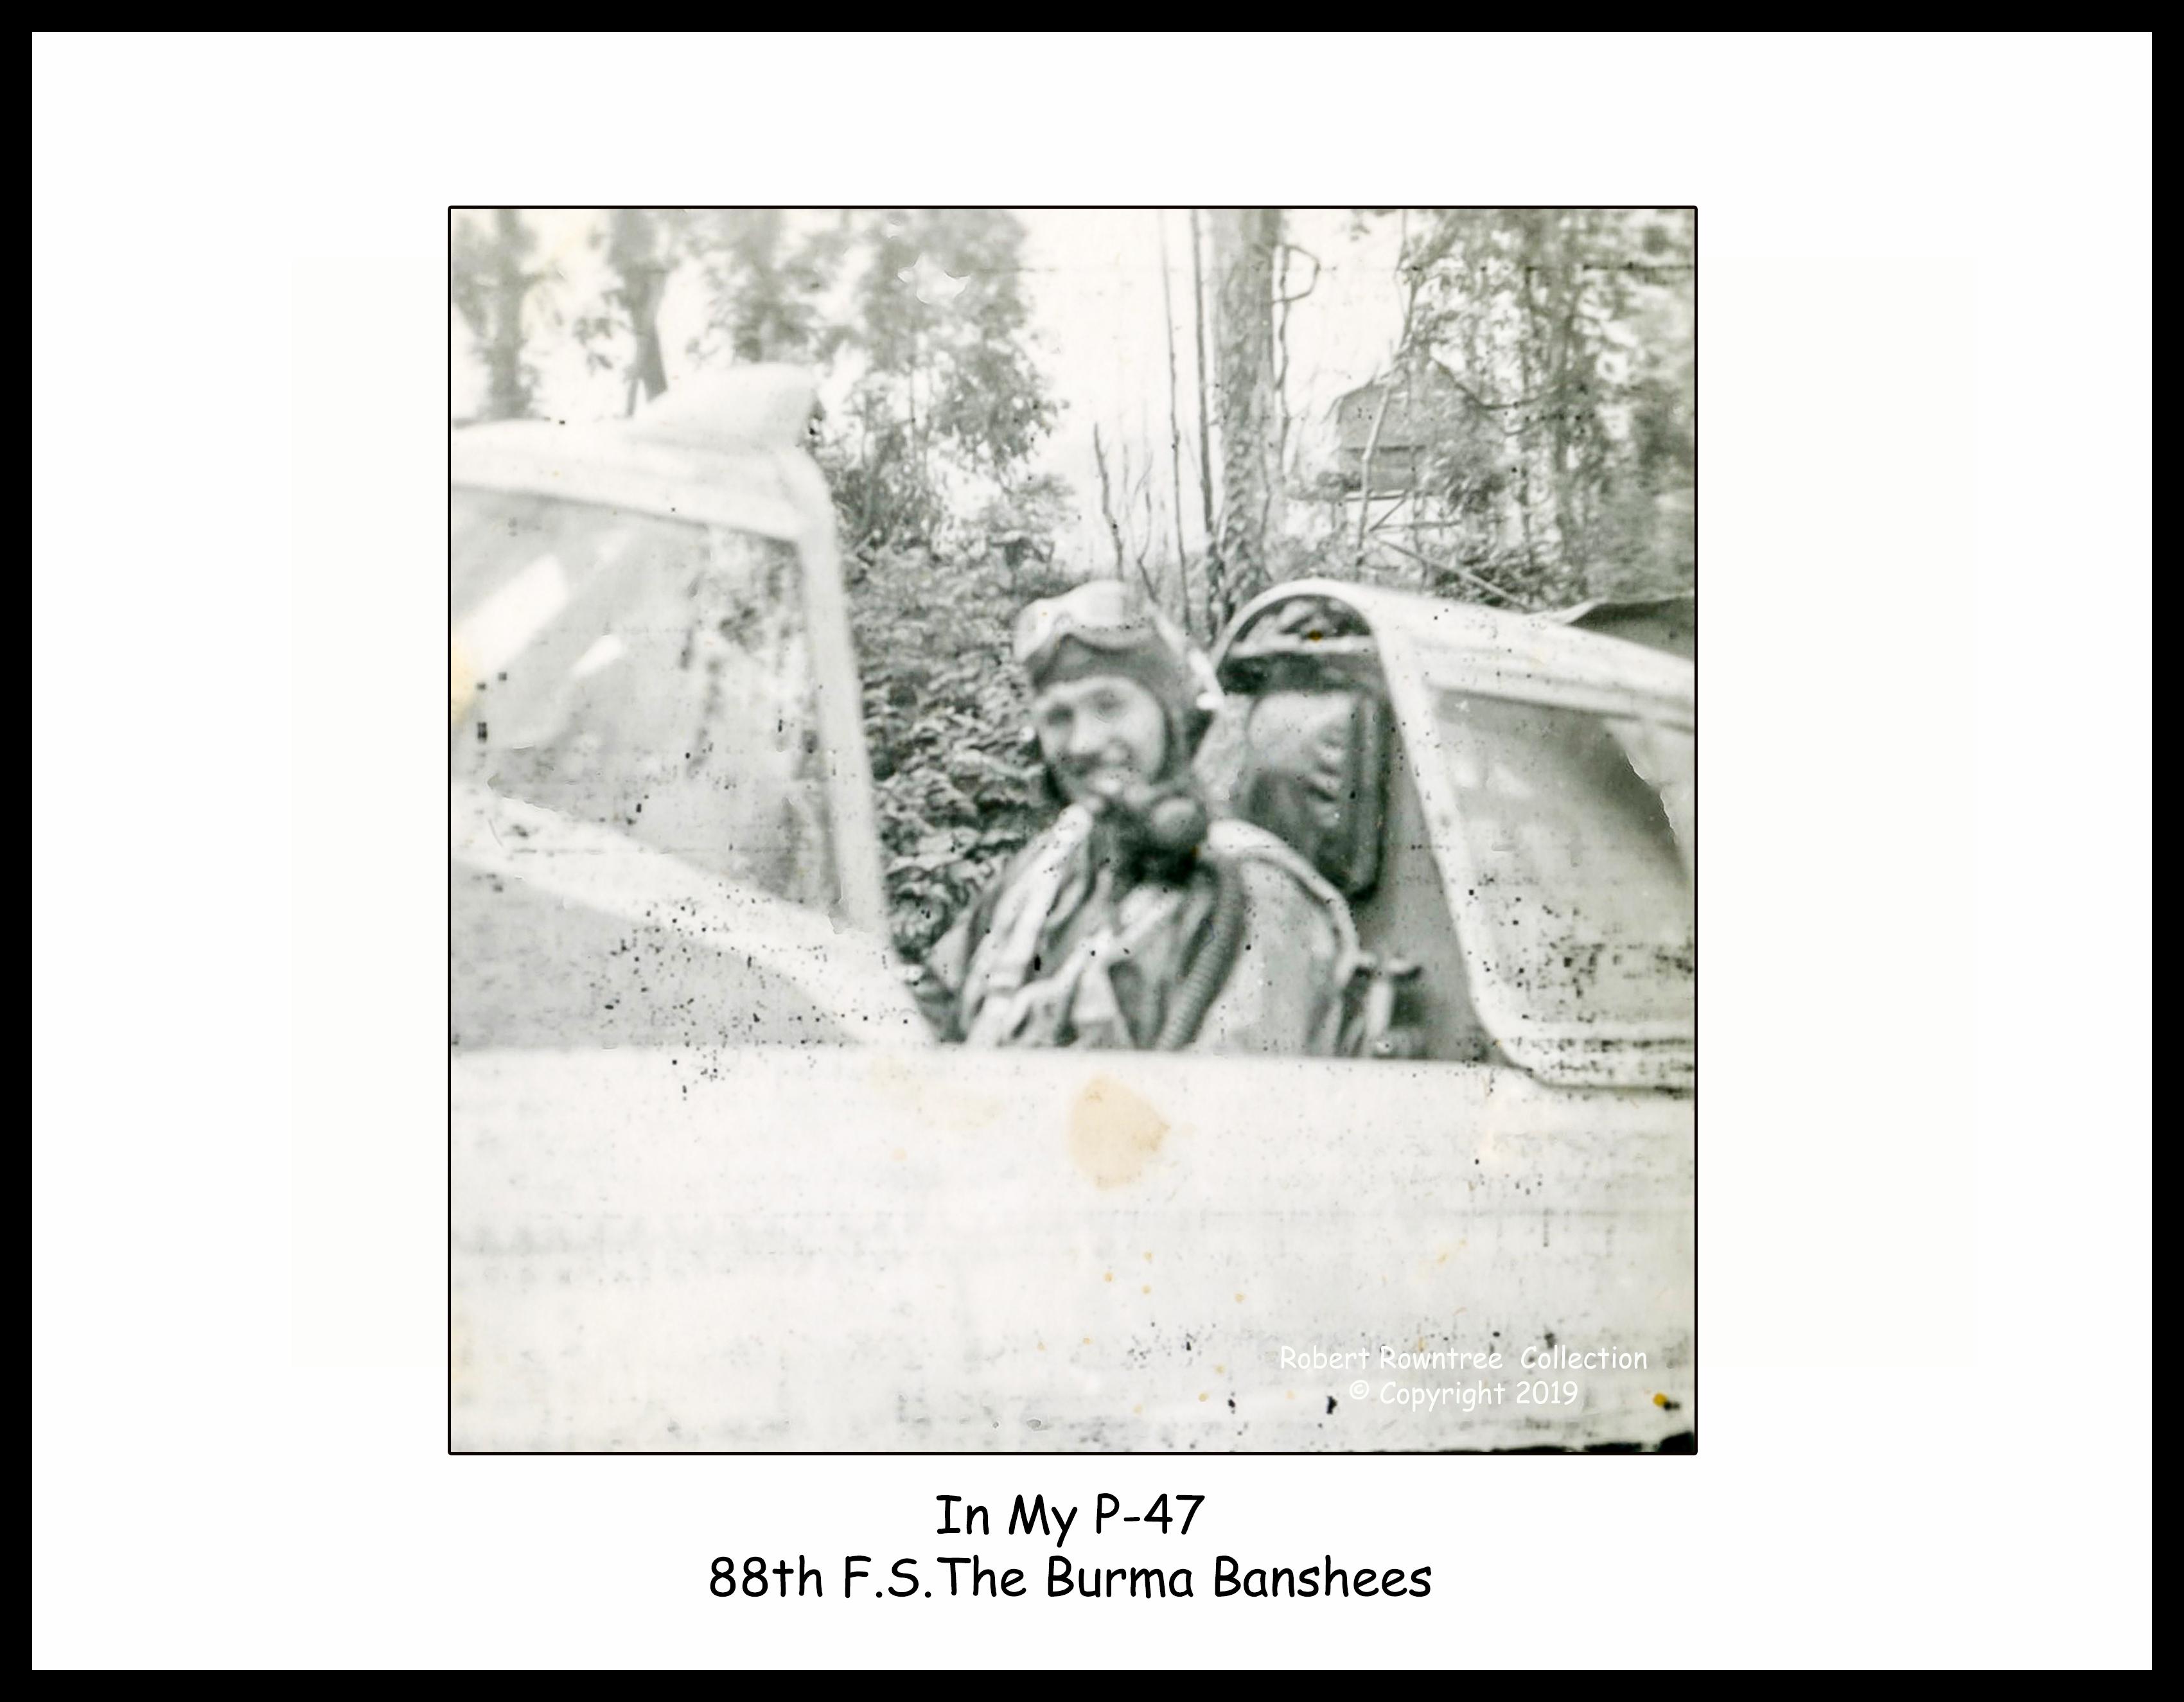 Robert Rowntree 51